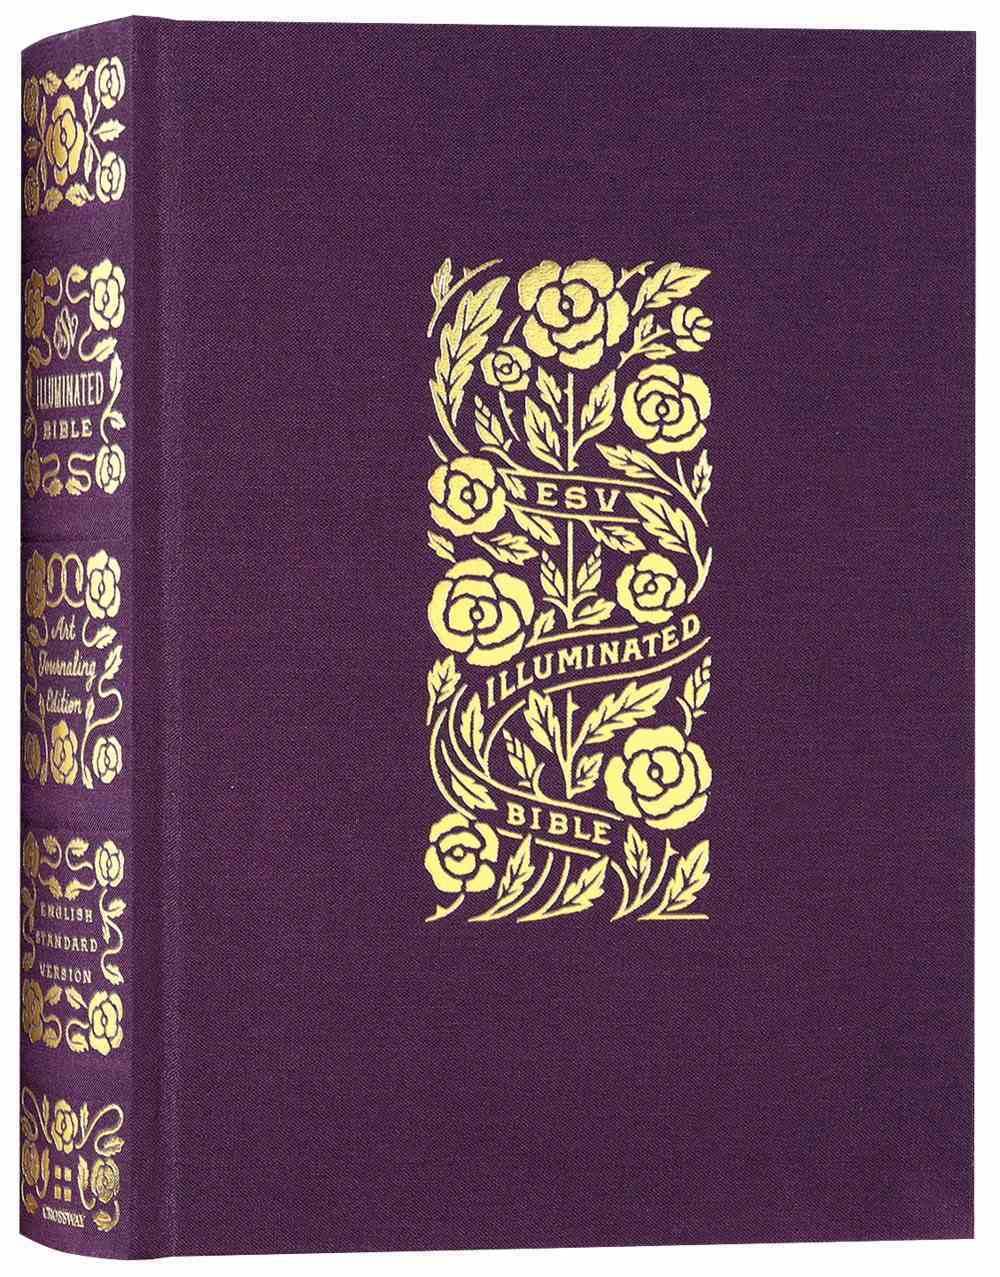 ESV Illuminated Bible Art Journaling Edition Eggplant (Black Letter Edition) Fabric Over Hardback